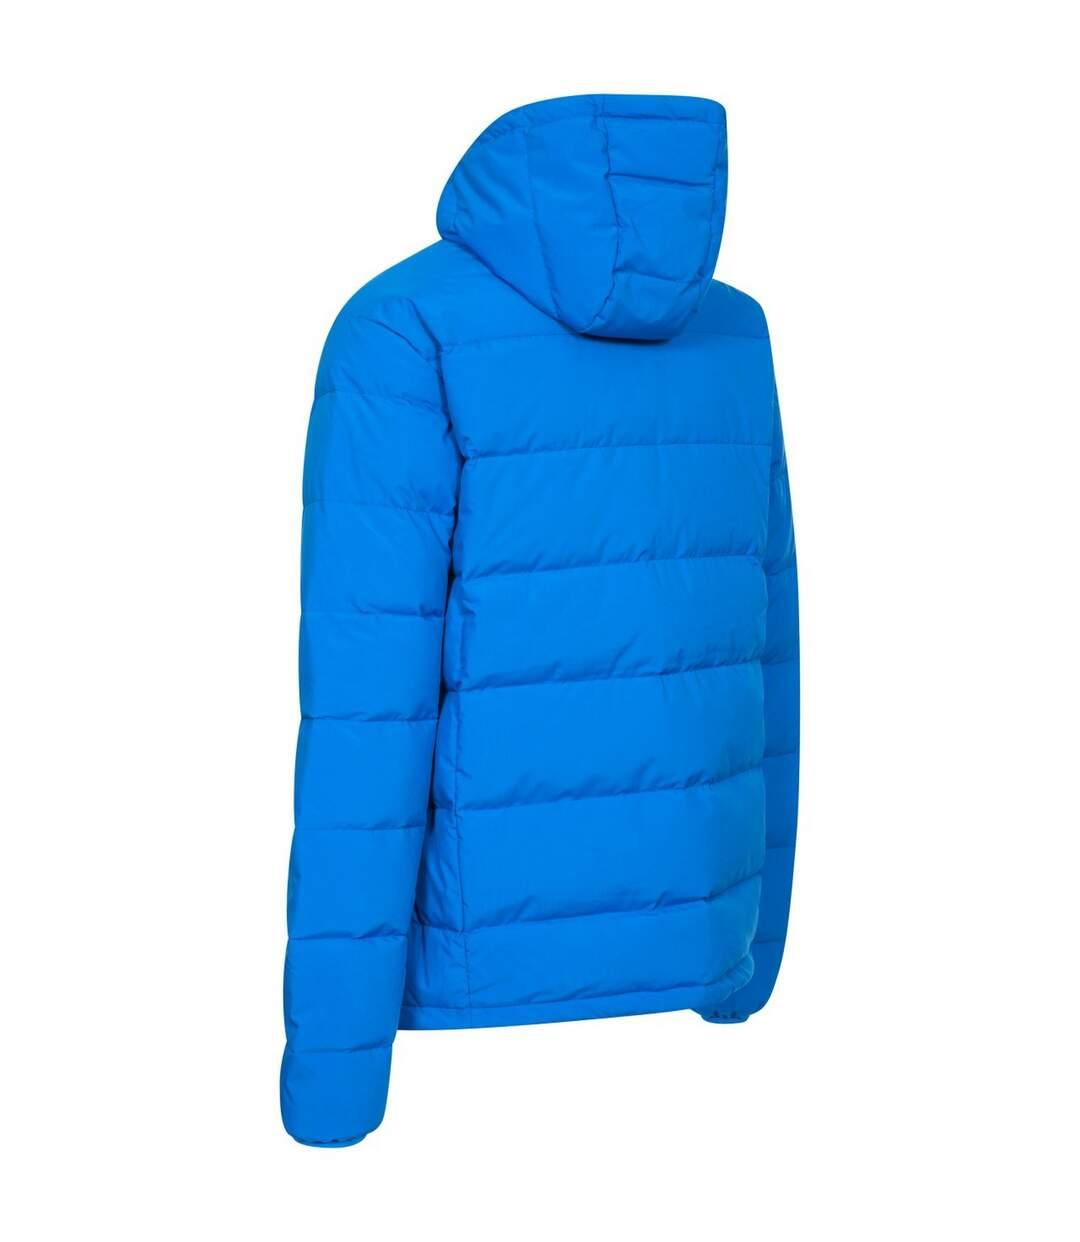 Trespass Mens Crane DLX Down Jacket (Blue) - UTTP3774